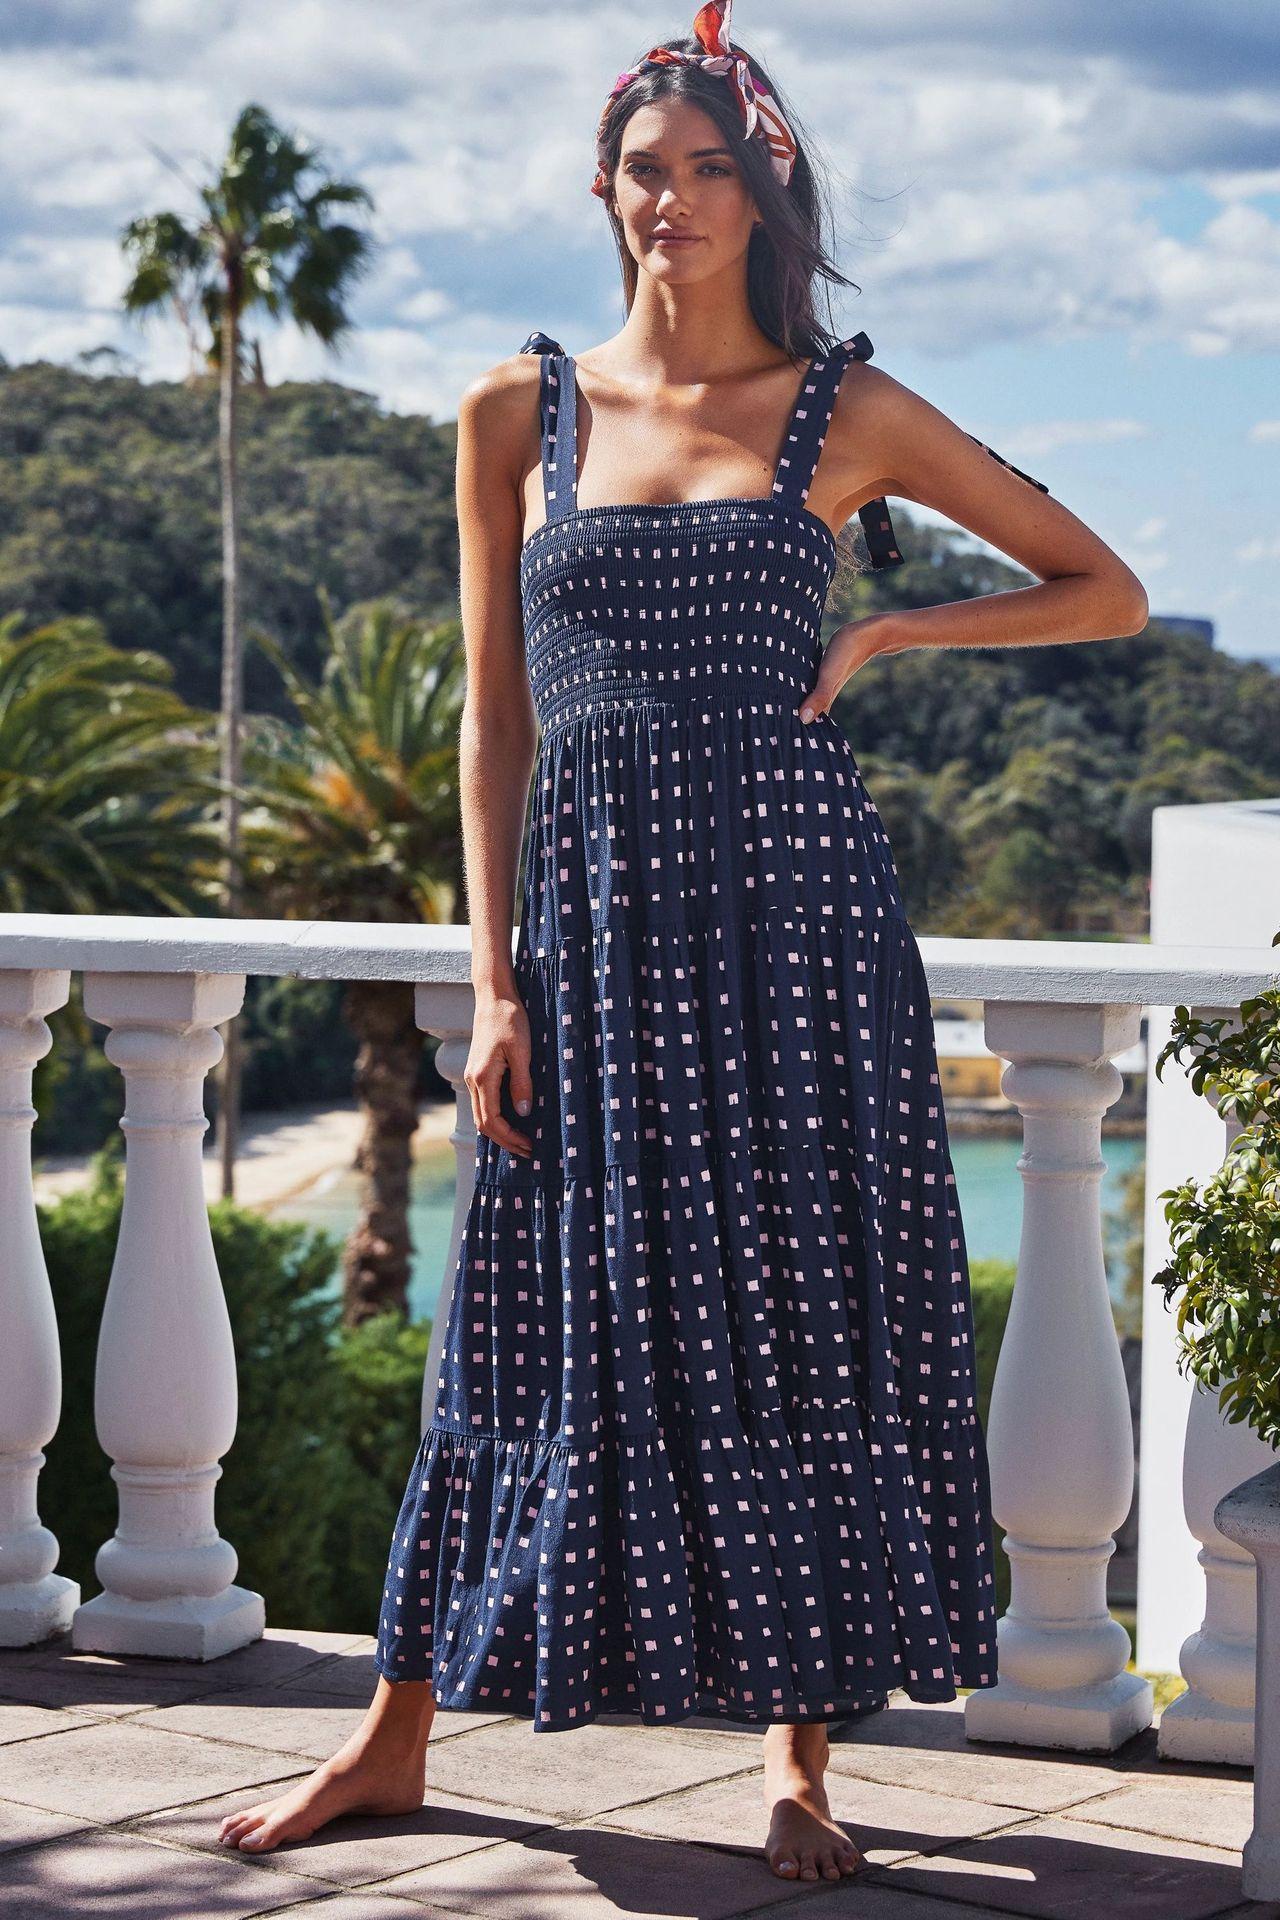 Fashion Summer Women Dress Square Neck Sling Print Sexy Halter Beach Dress Women's Casual Holiday Dresses 2021 New Vestidos 9